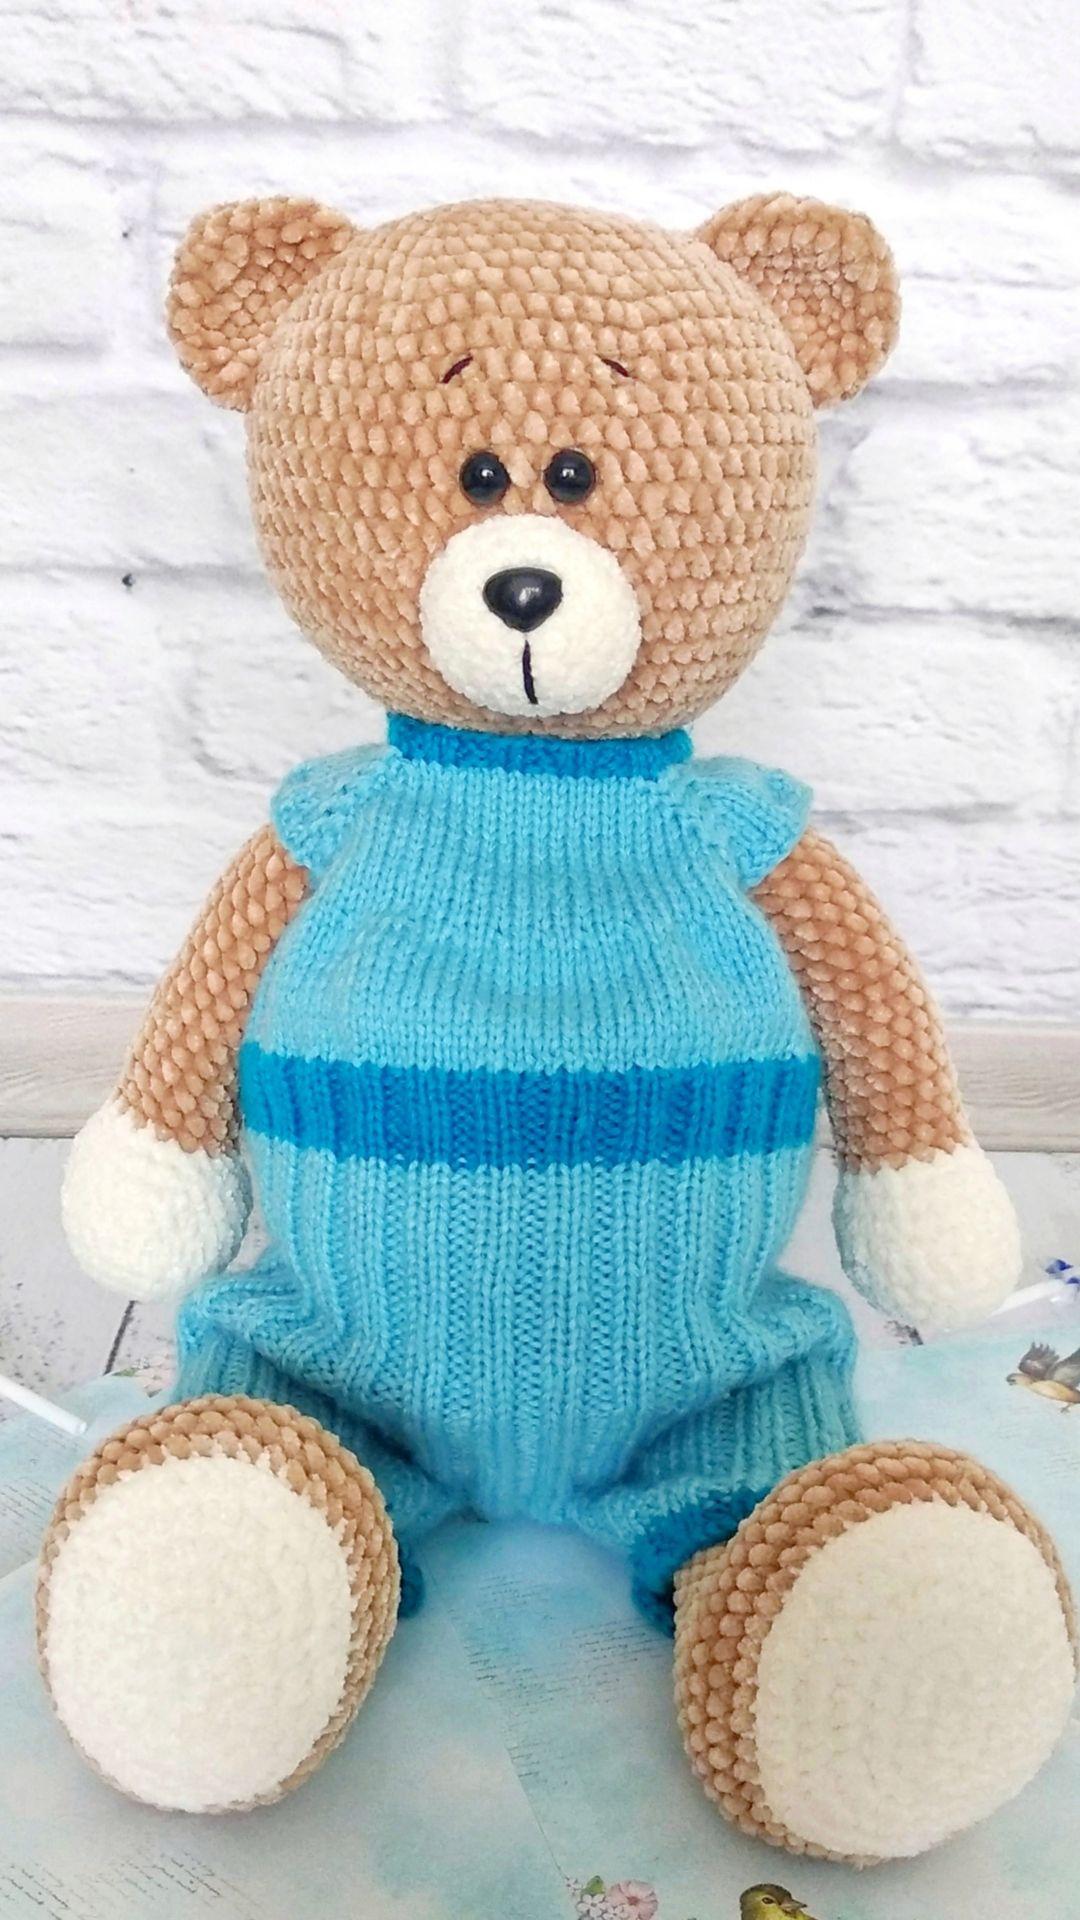 Predownload: Teddy Bear Lovey Crochet Pattern Security Blanket Comforter Etsy Handmade Toys Crochet Bear Bear Nursery Decor [ 1920 x 1080 Pixel ]